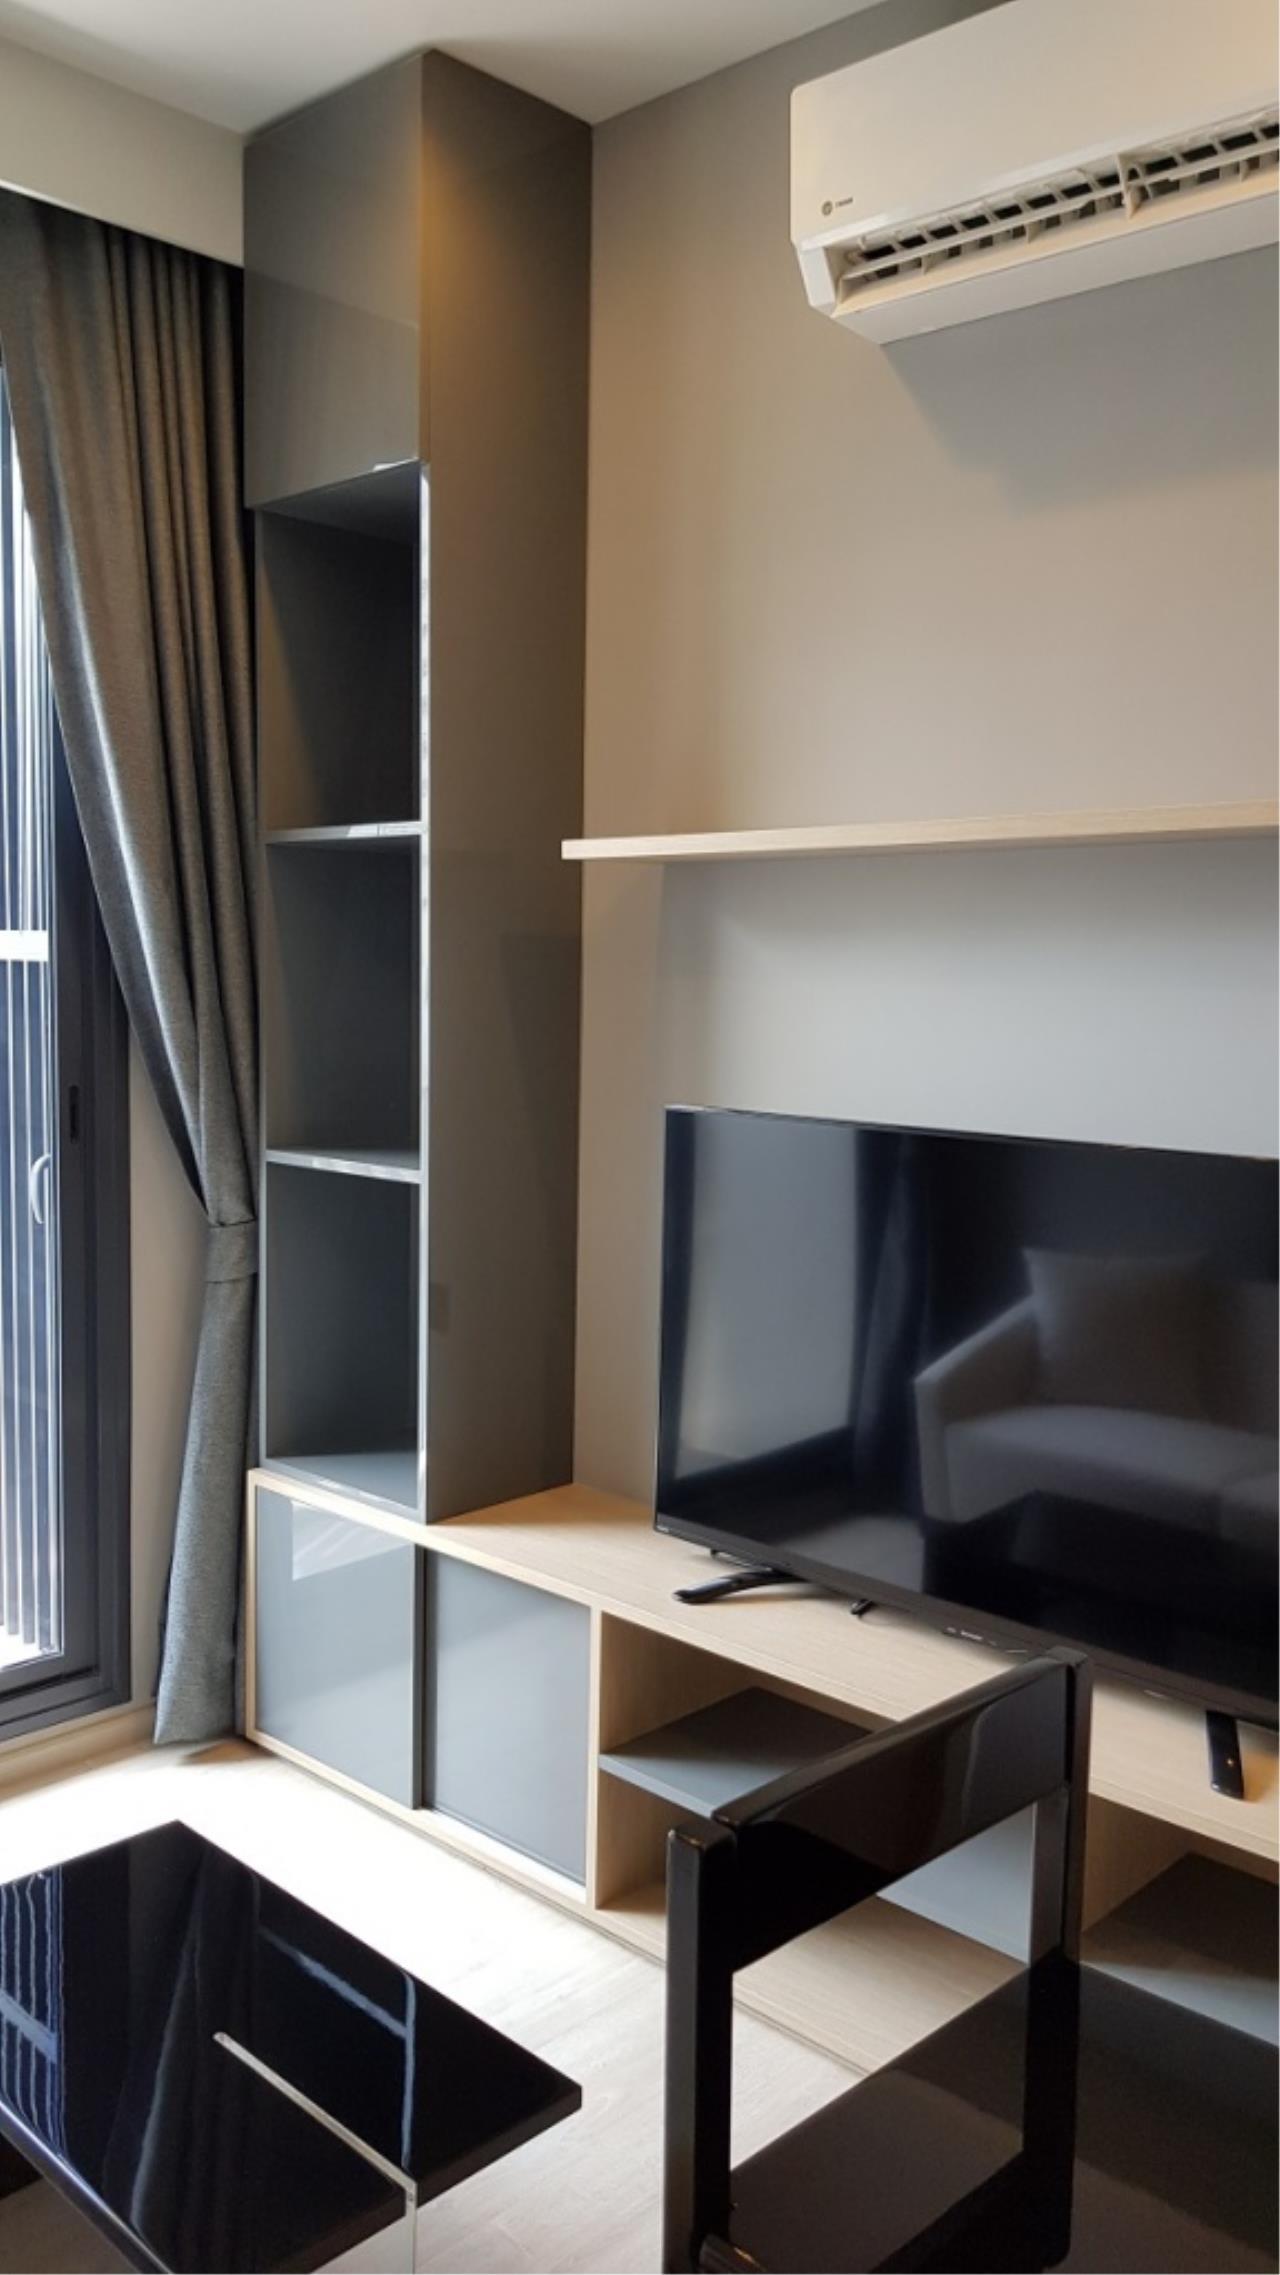 Century21 Skylux Agency's M Thonglor 10 / Condo For Rent / 1 Bedroom / 32 SQM / BTS Thong Lo / Bangkok 3